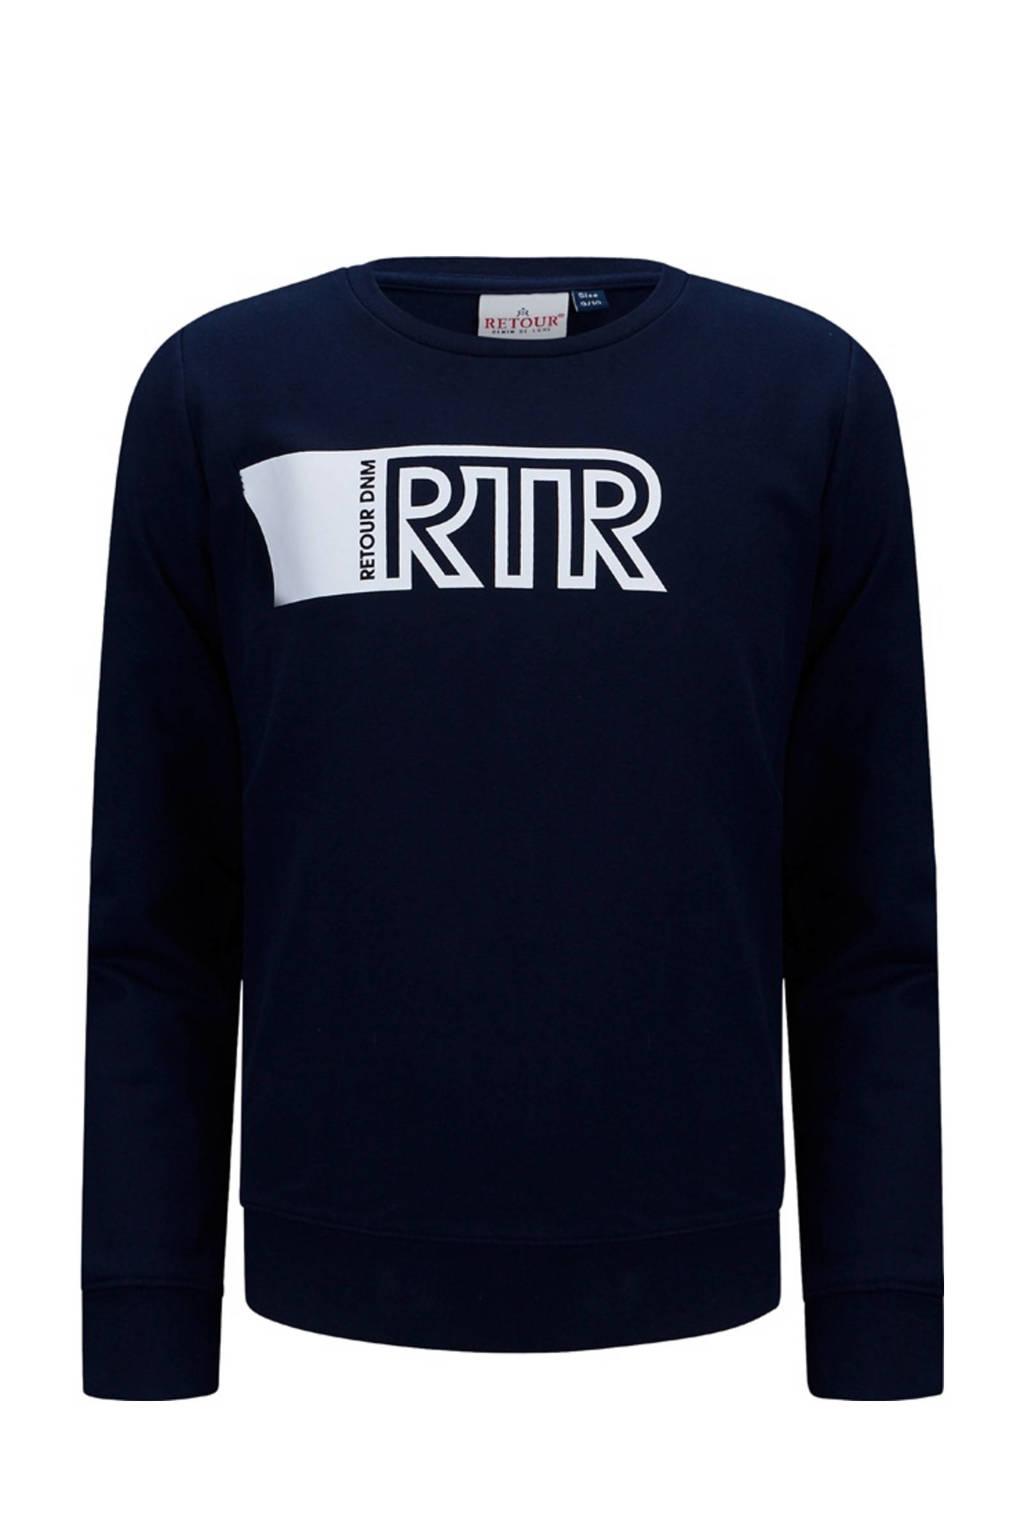 Retour Denim sweater Jannes met printopdruk donkerblauw, Donkerblauw